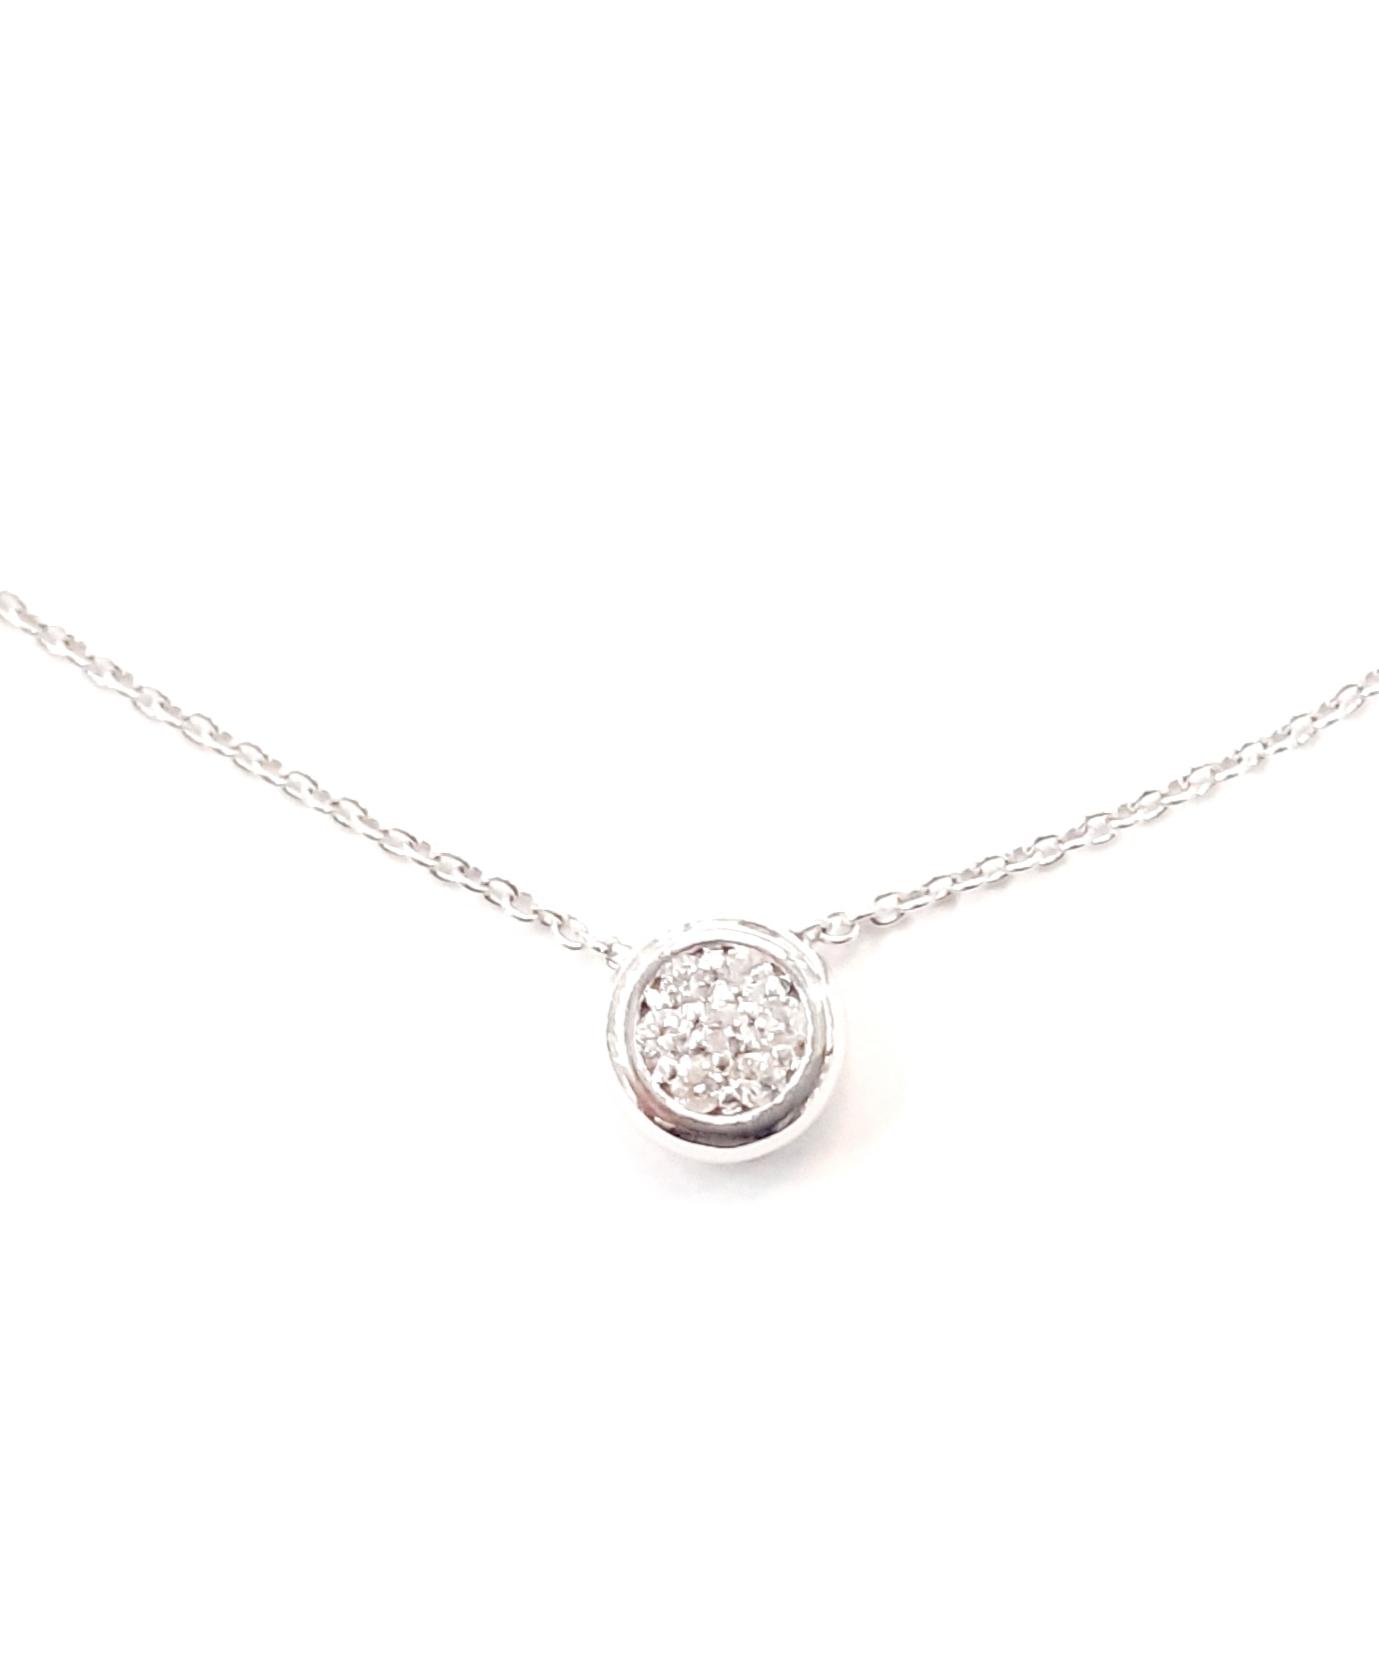 Sensi joyas jewellery Granada silver engagementDIAMONDS  GOLD PENDANT